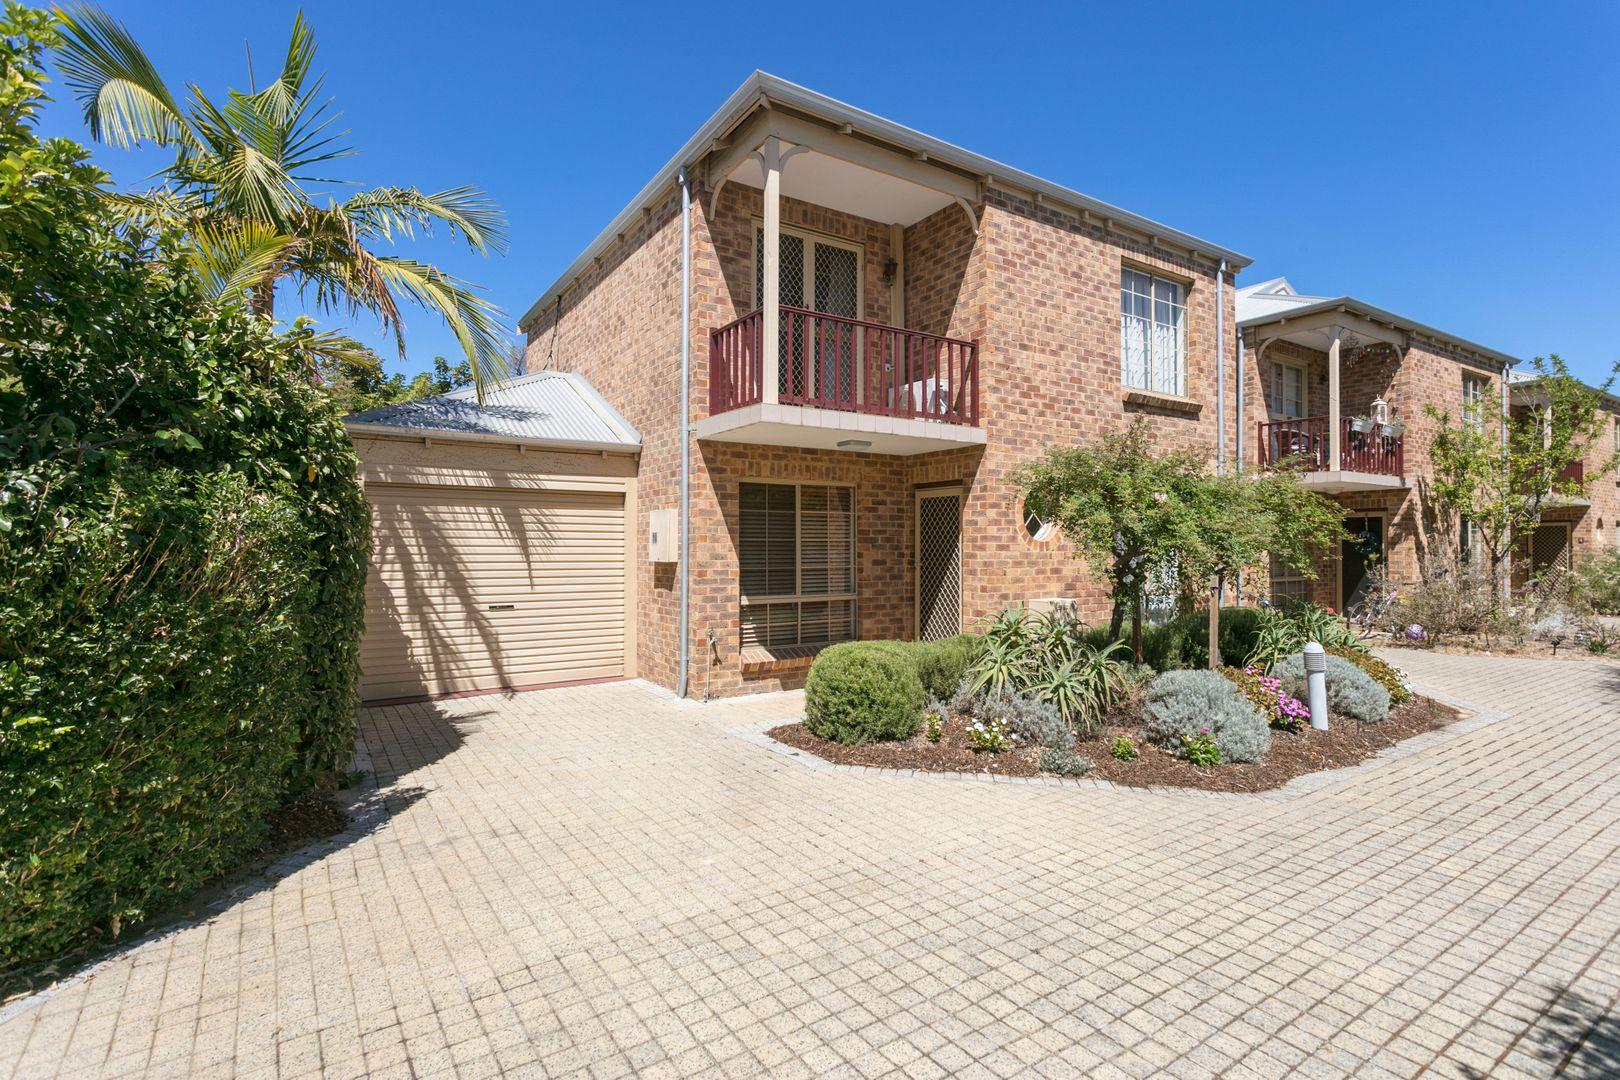 2/4 John Street, North Fremantle WA 6159, Image 0